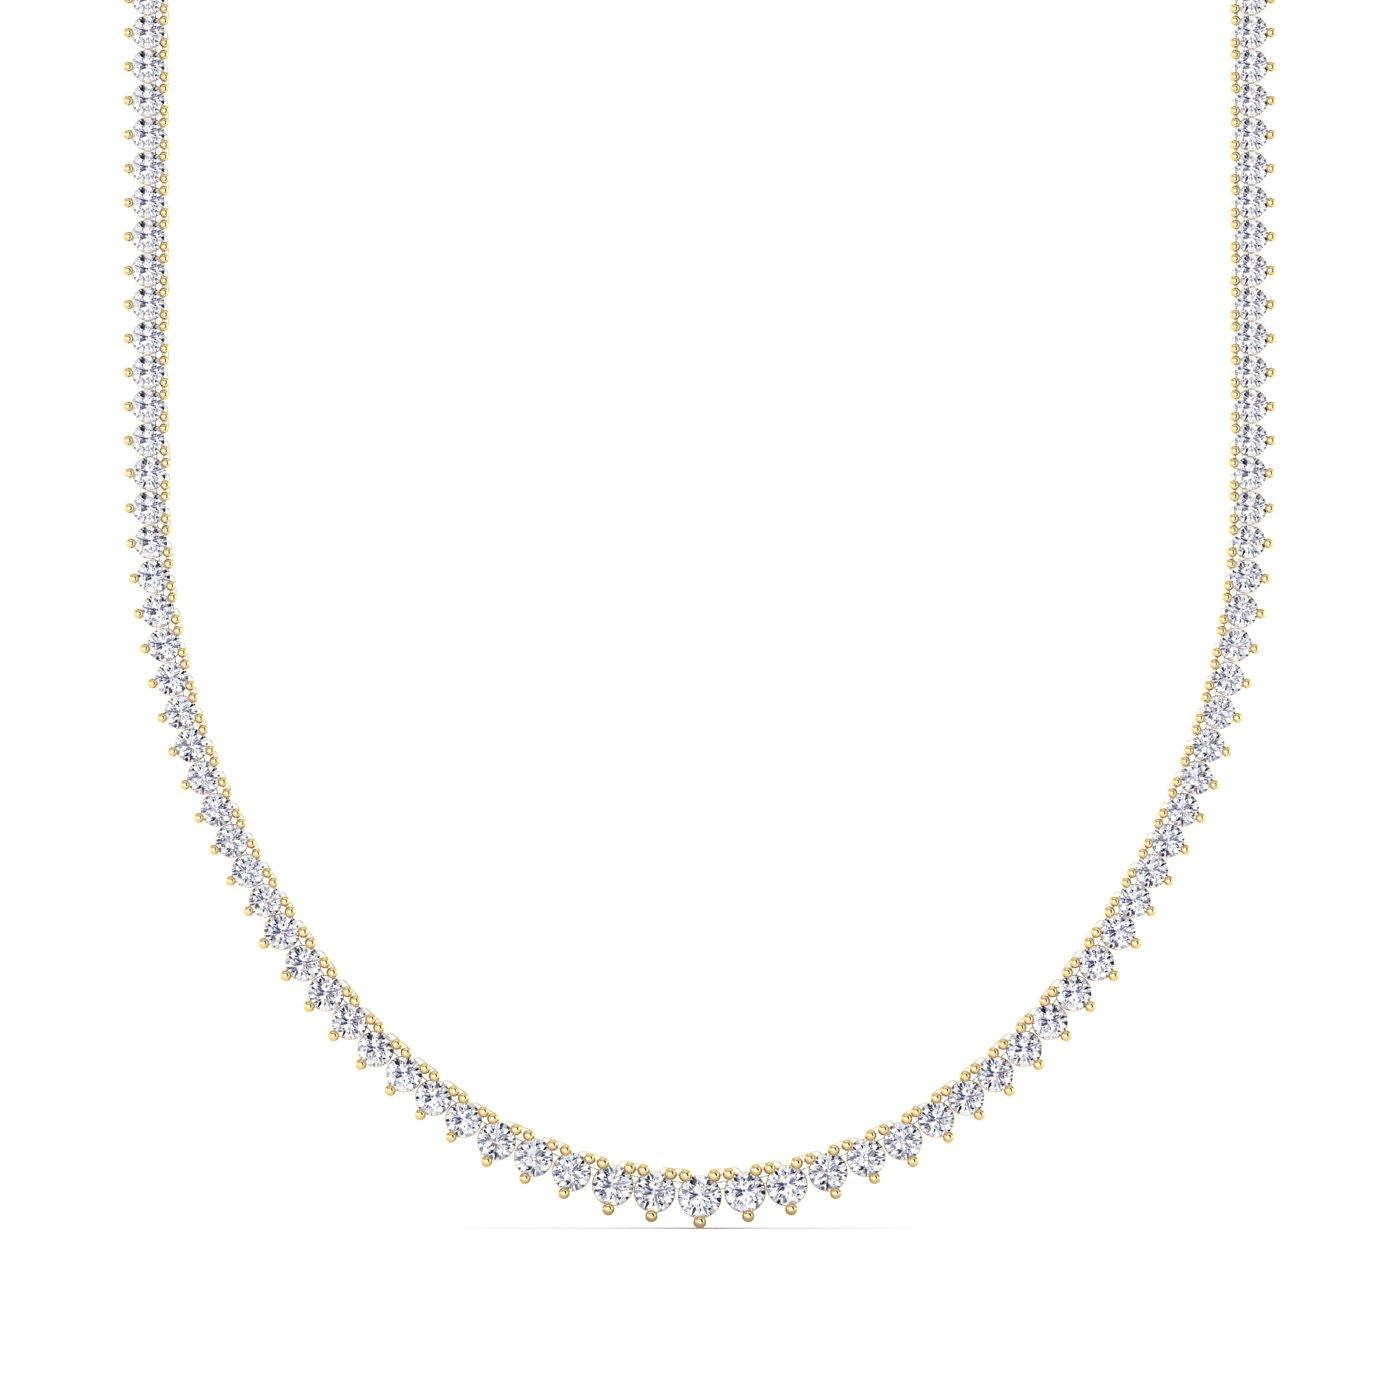 14K Yellow Gold Lab Grown Diamond Tennis Necklace (10.54 TCW)